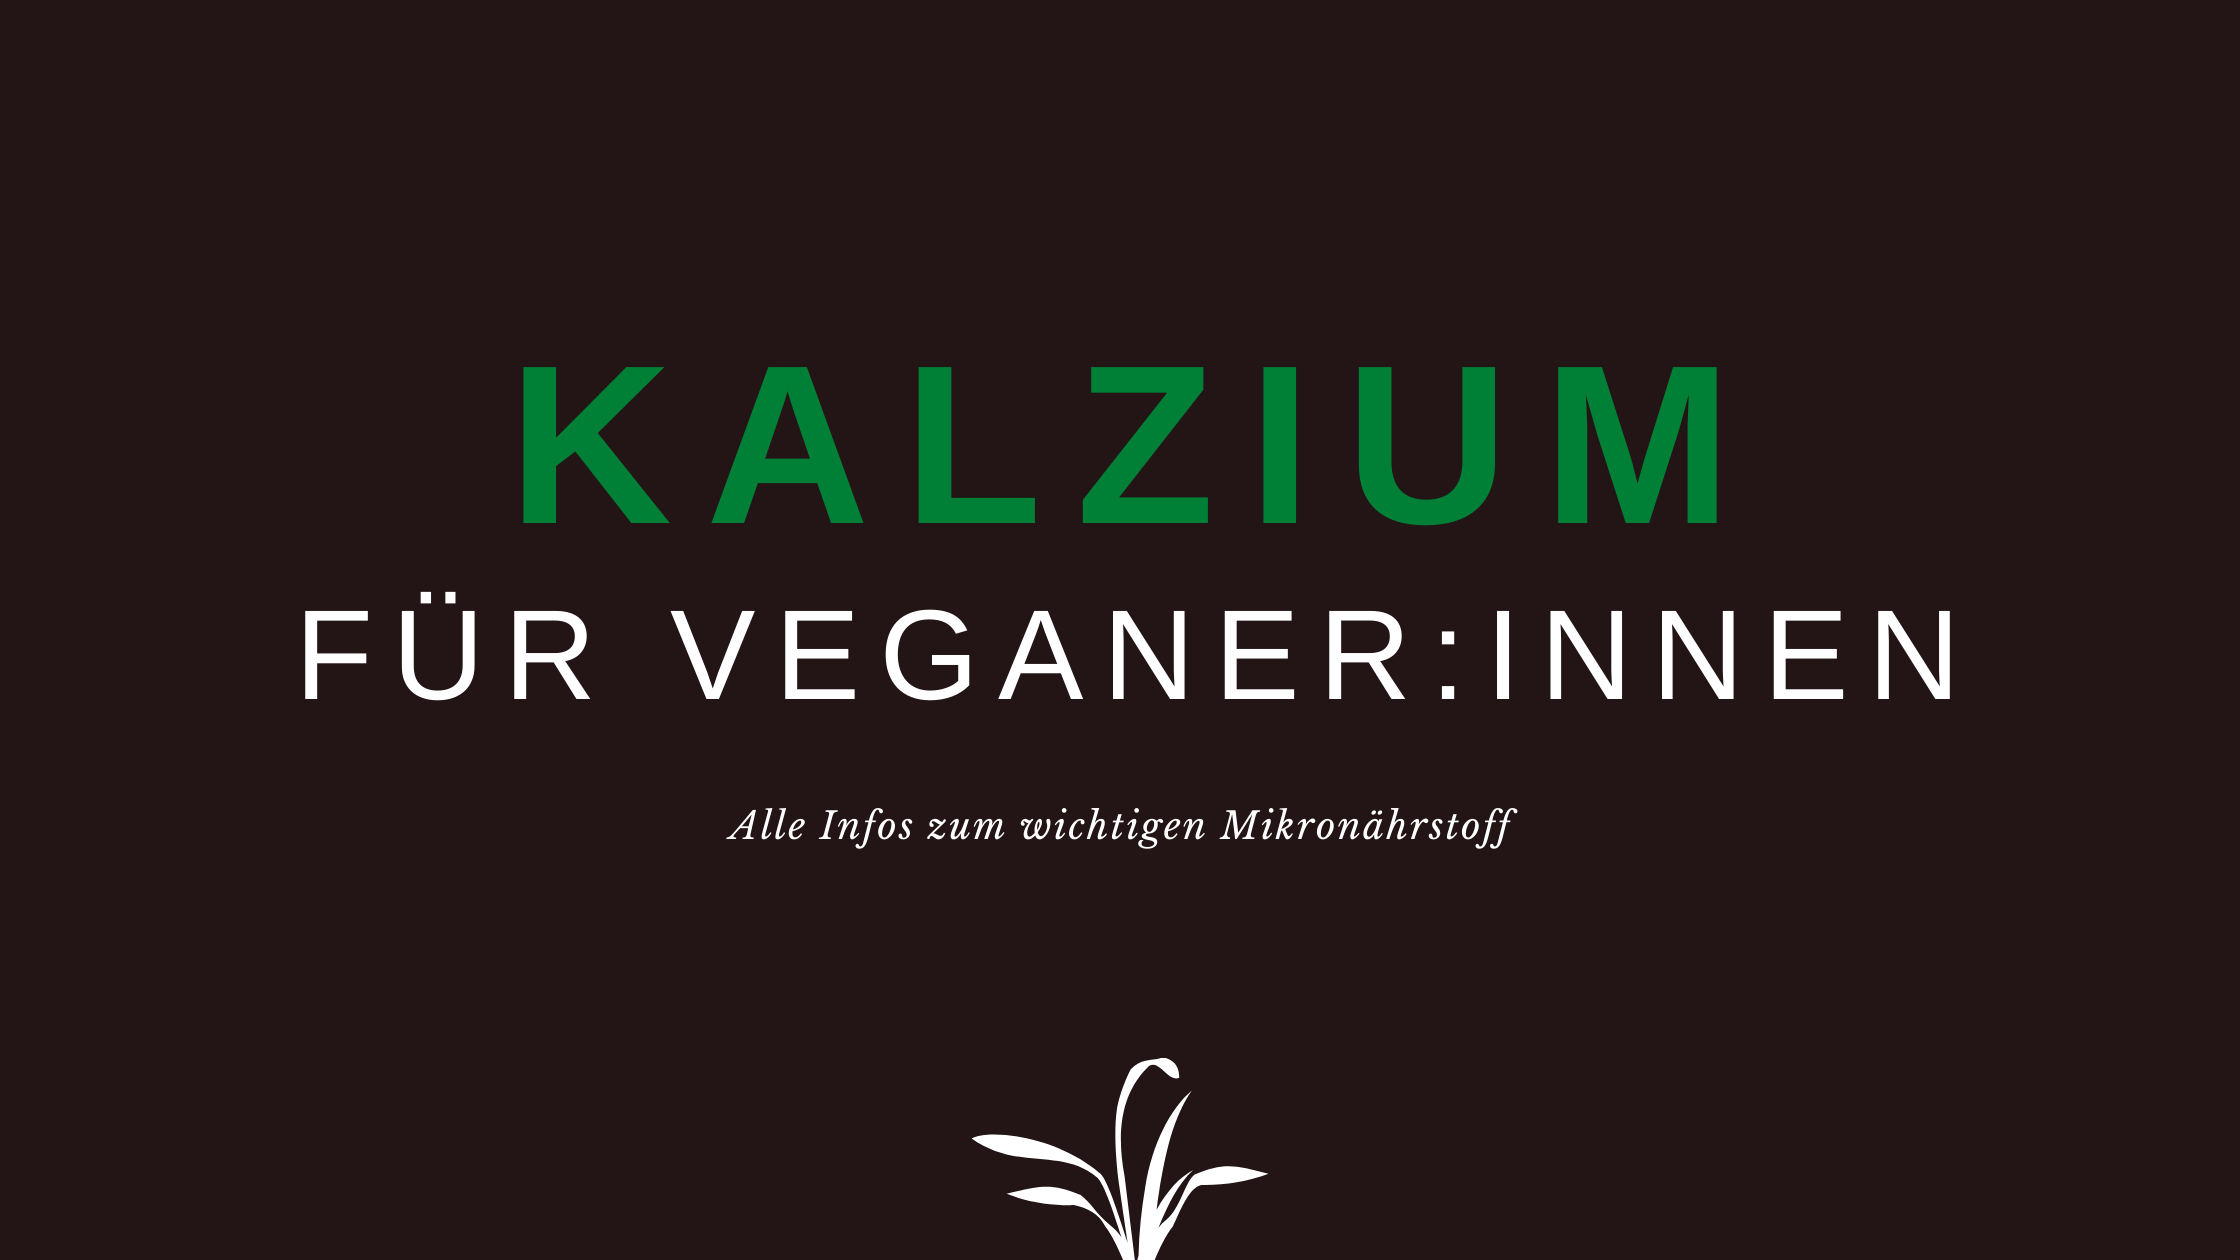 Kalzium vegan